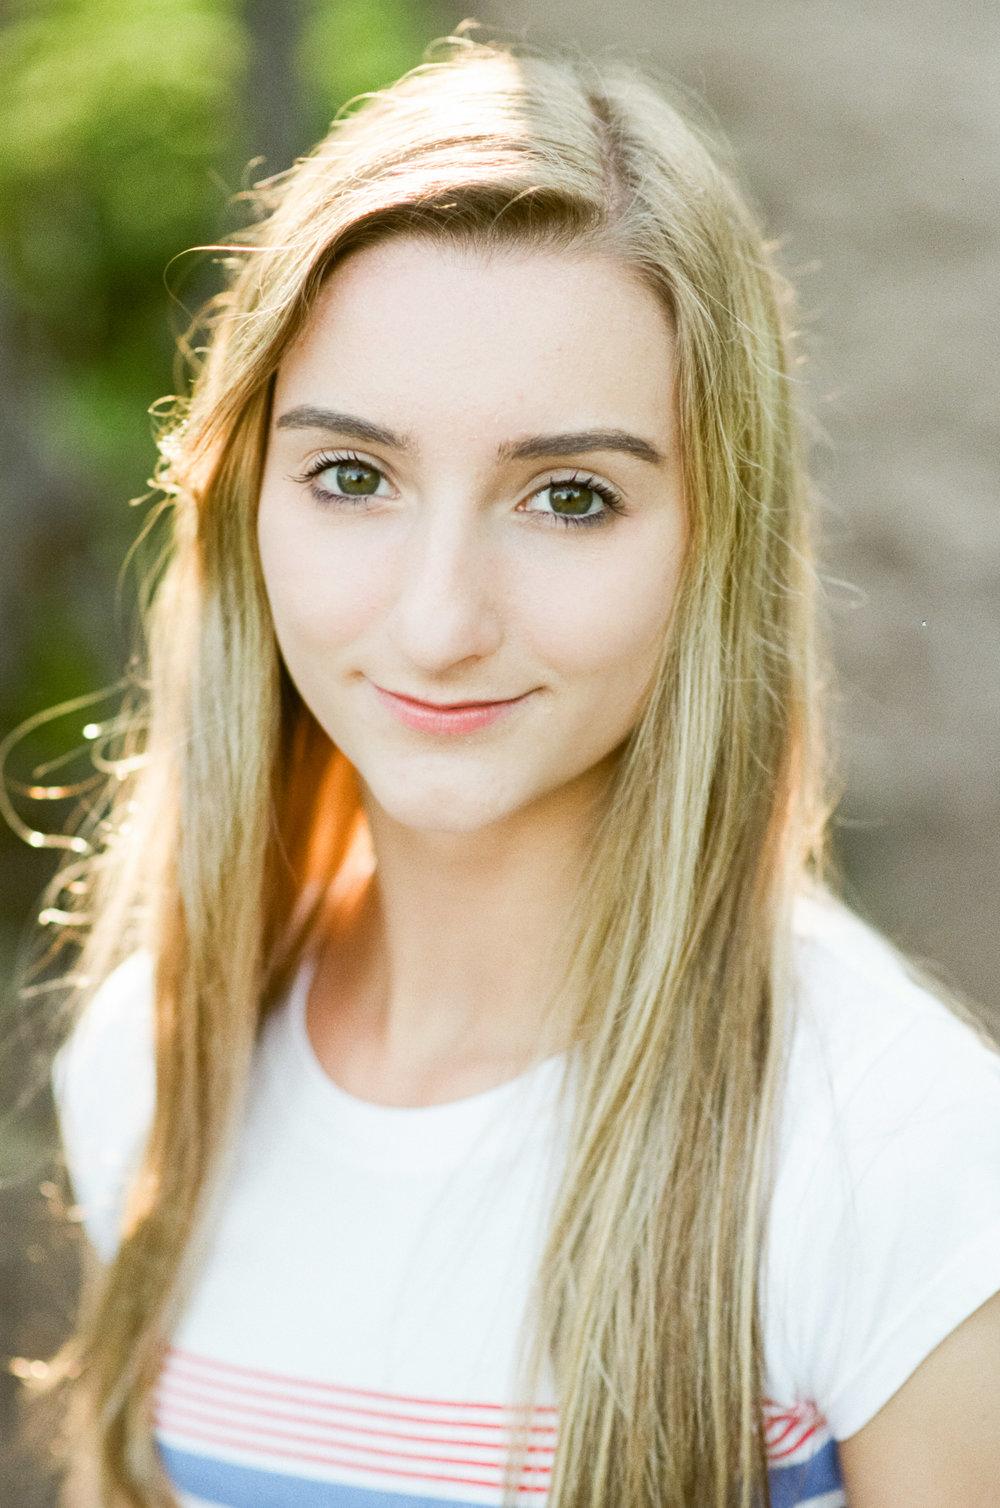 Shoreview-Senior-Photographer-Film-Artsy-Amy-Berge.jog